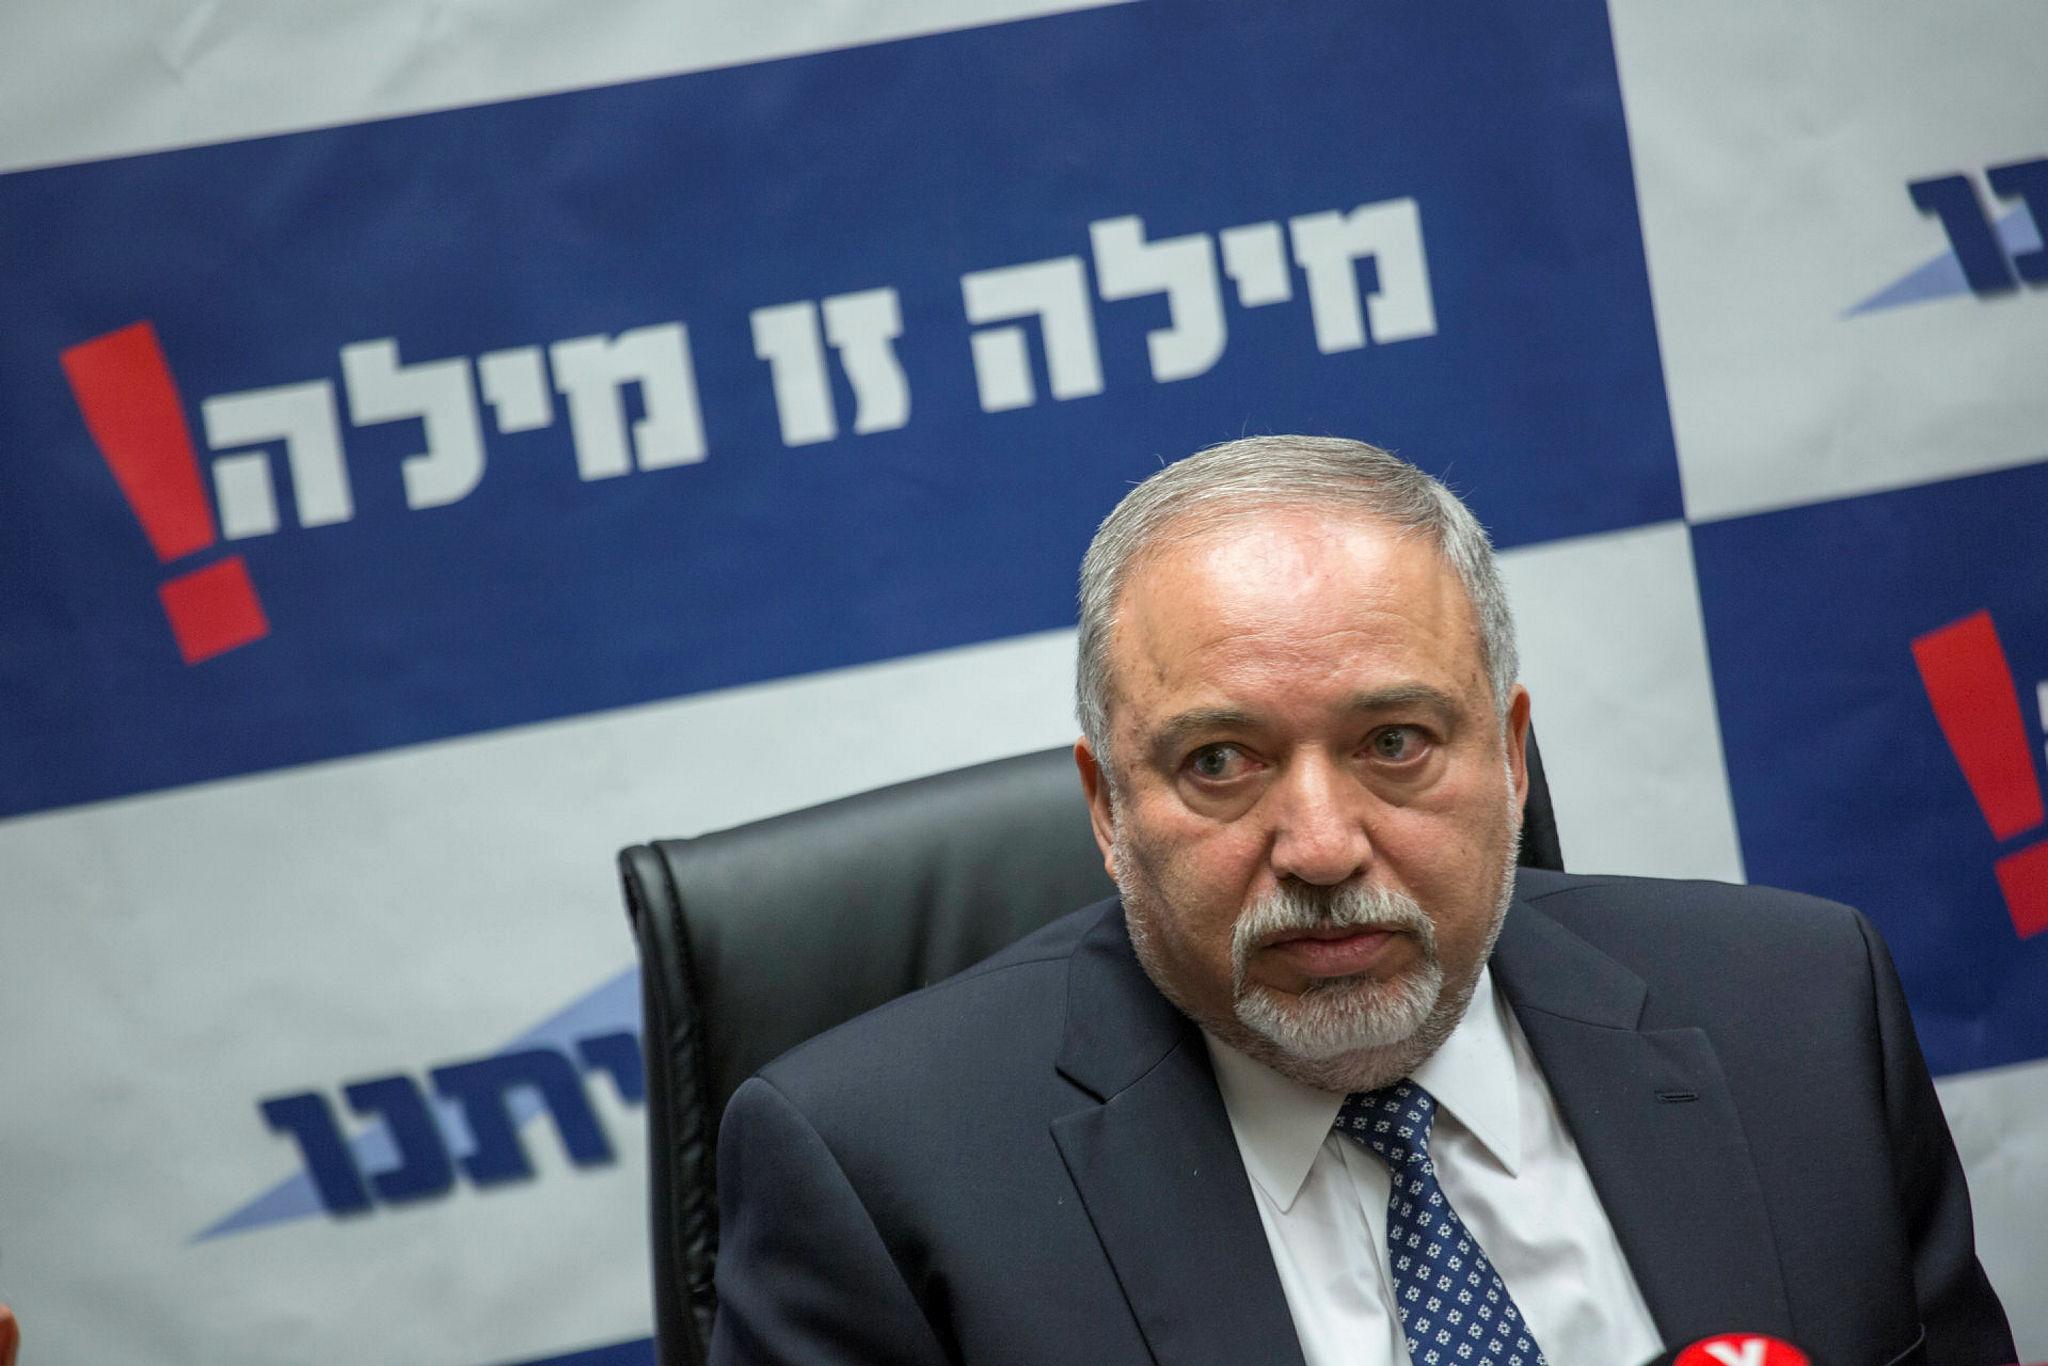 Avigdor Lieberman, Defense Minister of Israel